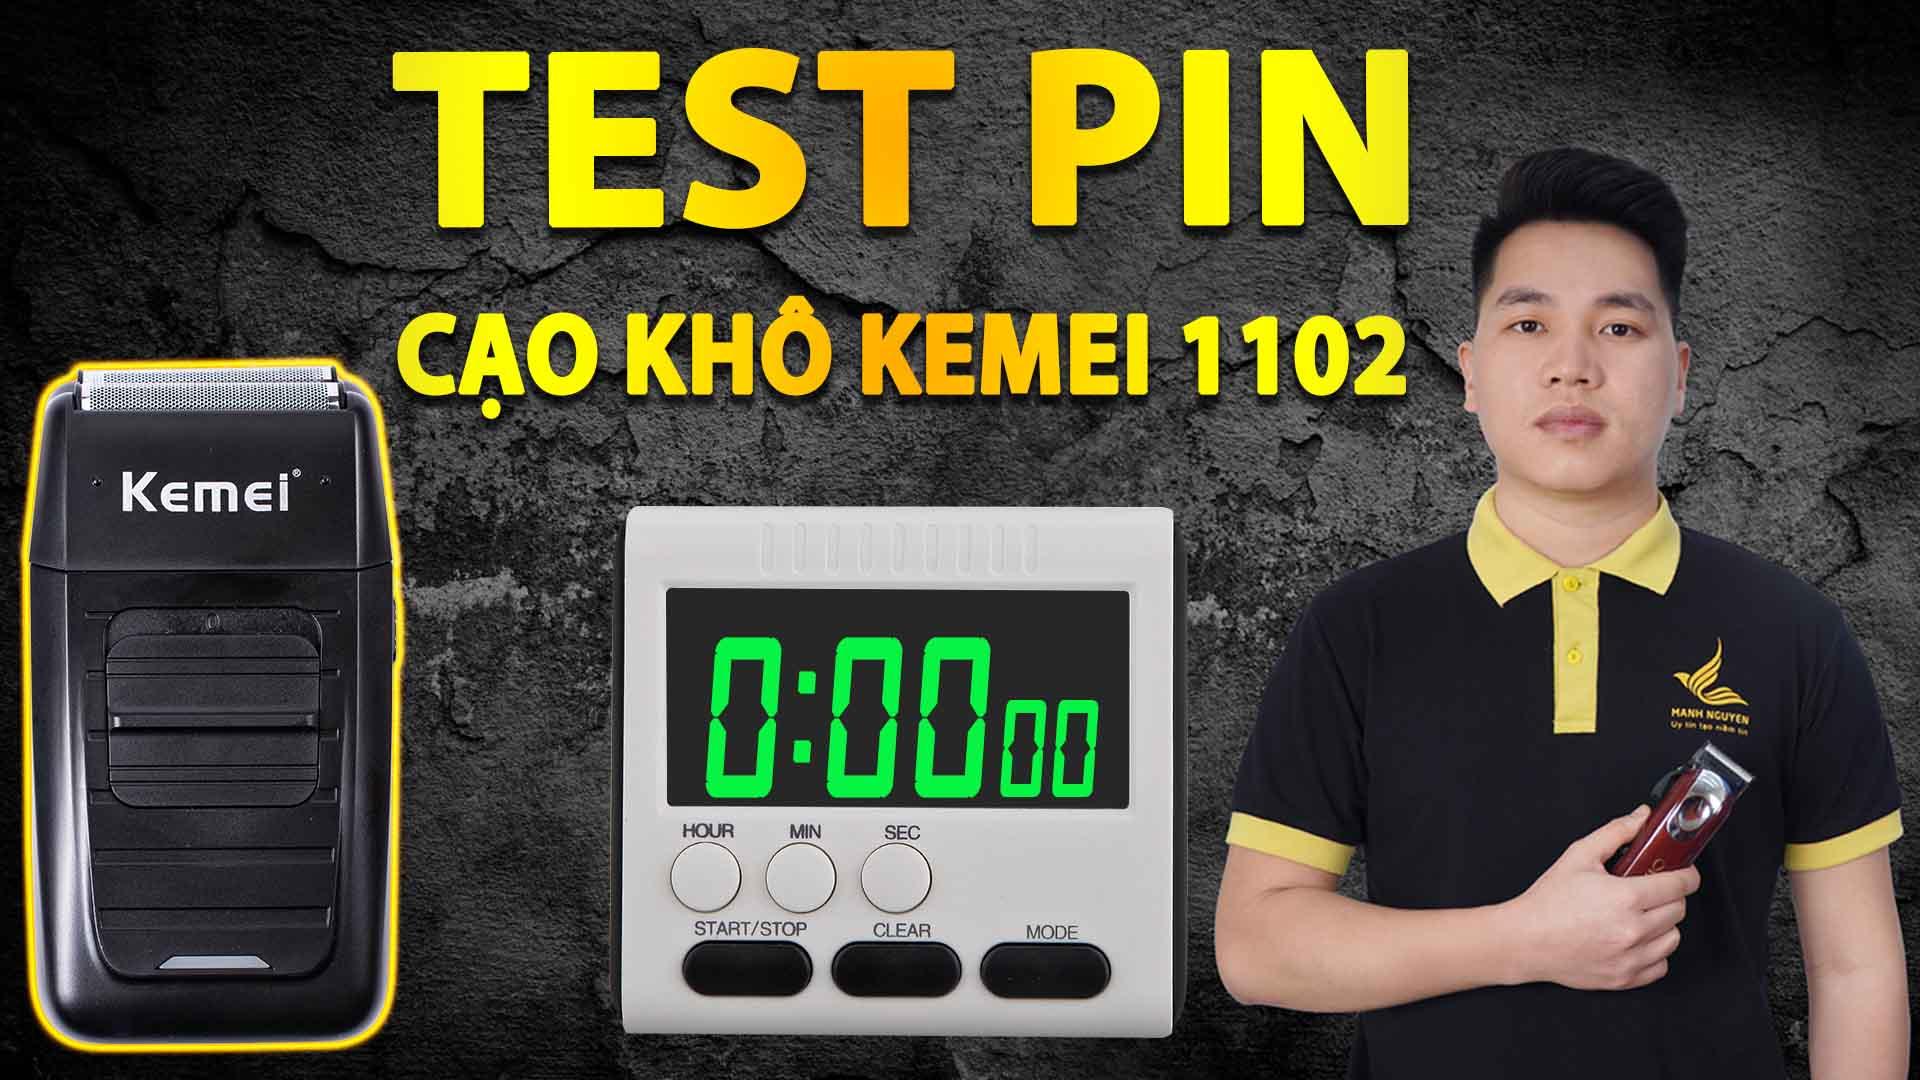 test pin cao kho kemei 1102